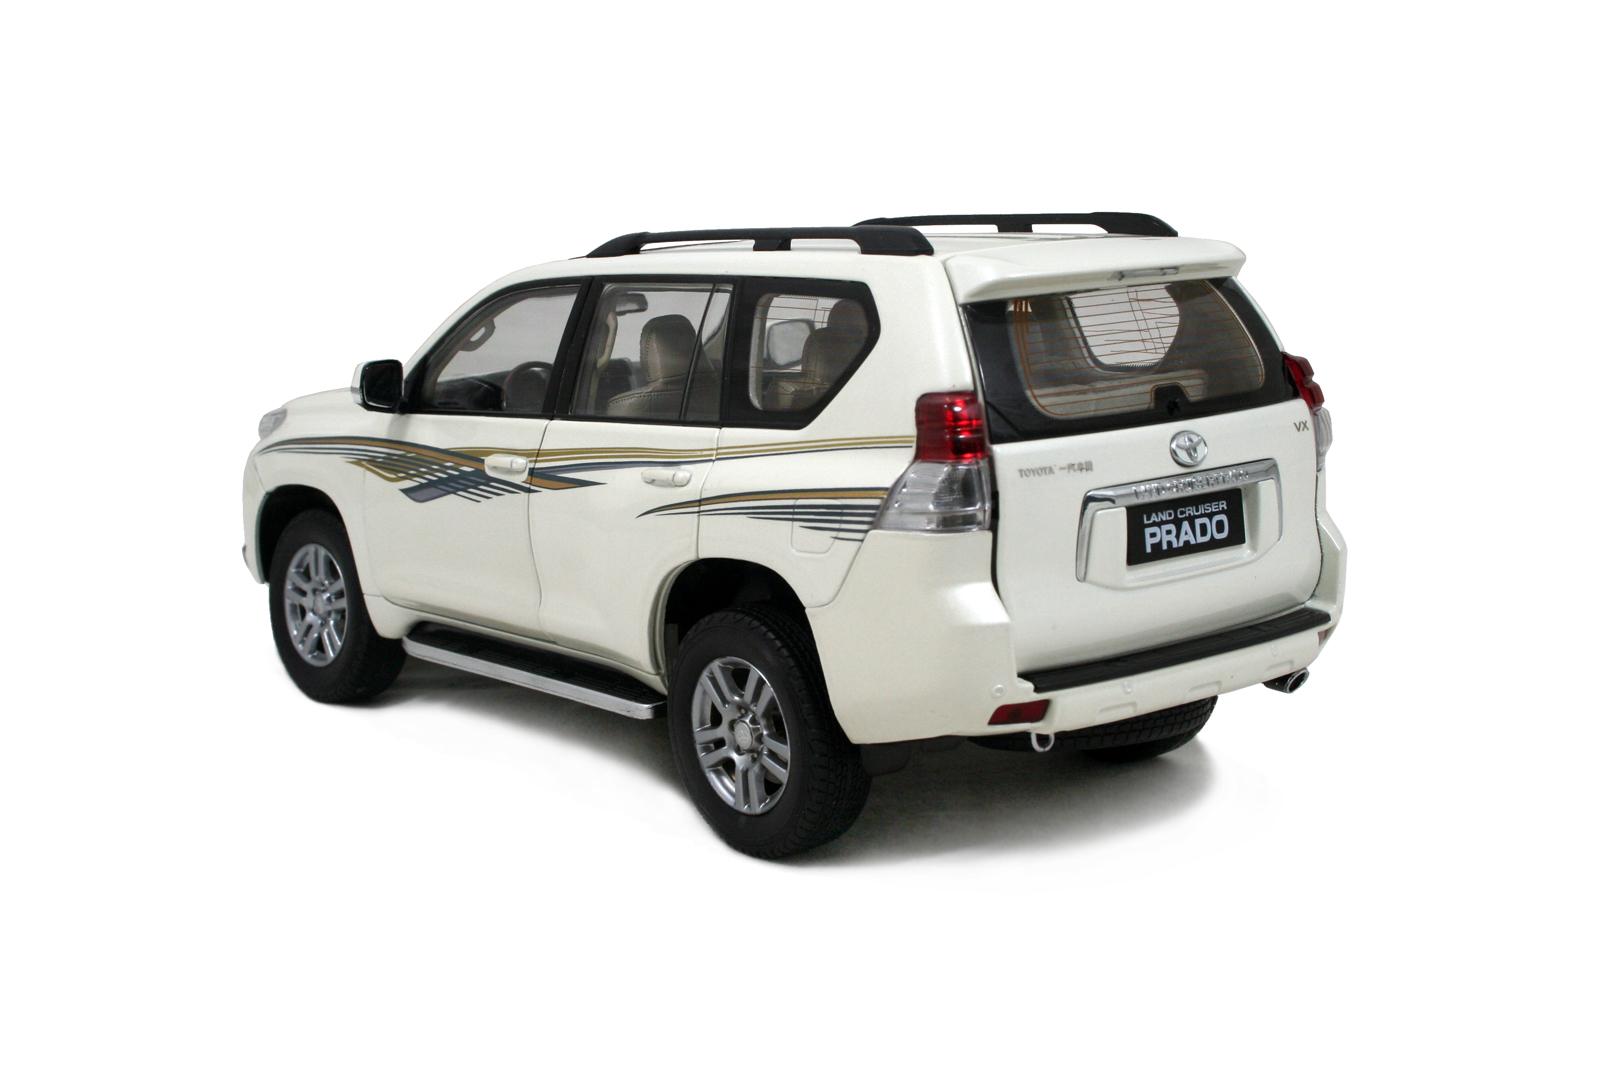 Toyota Land Cruiser Prado 2009 1 18 Scale Diecast Model